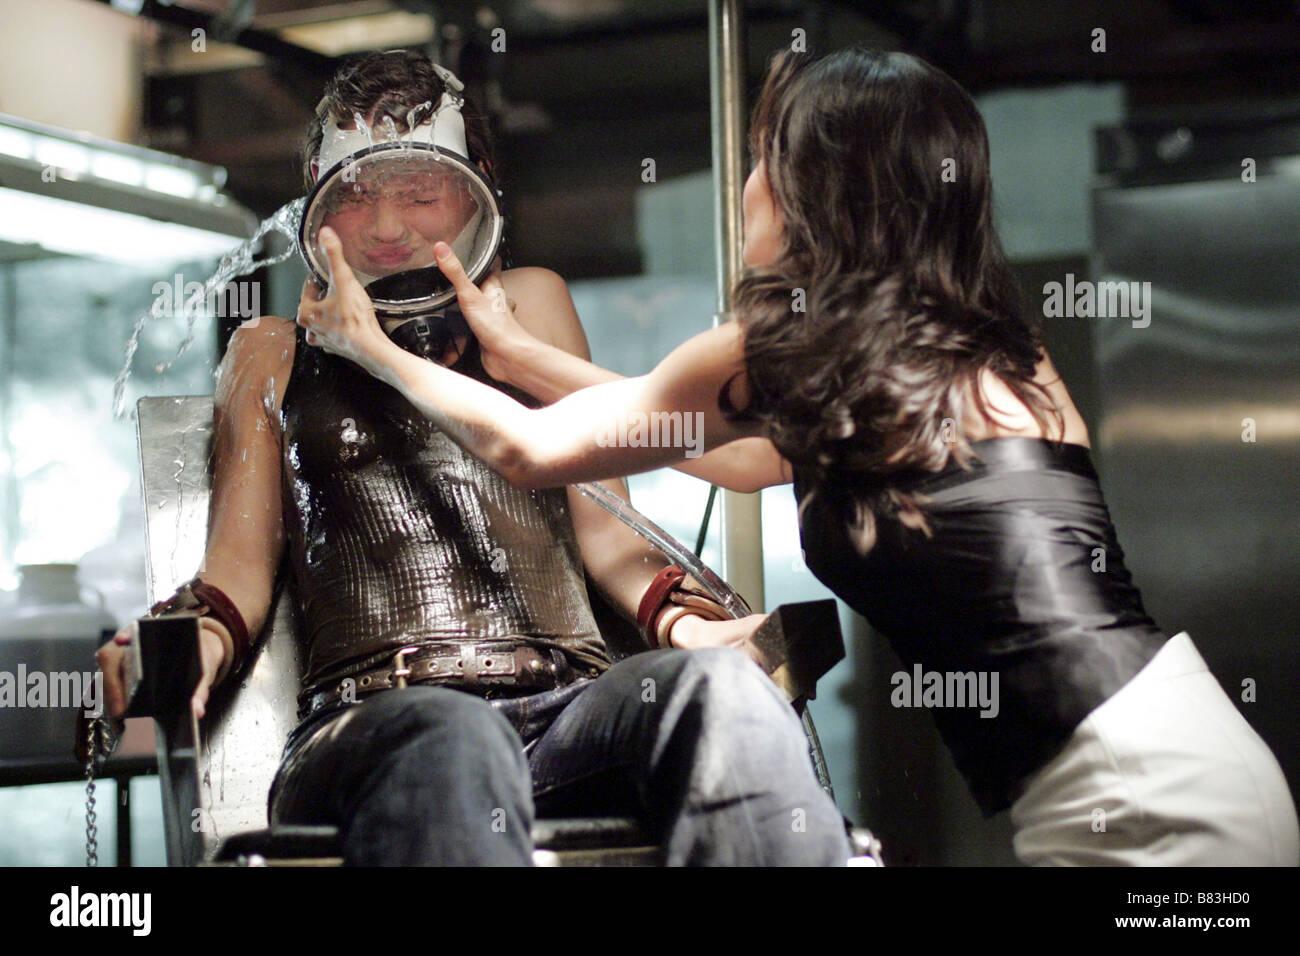 Alias (serie tv) Alias (2001)TV-Series 2001-2006 USA Jennifer Garner, Mía Maestro Authorized Personnel Only: - Stock Image